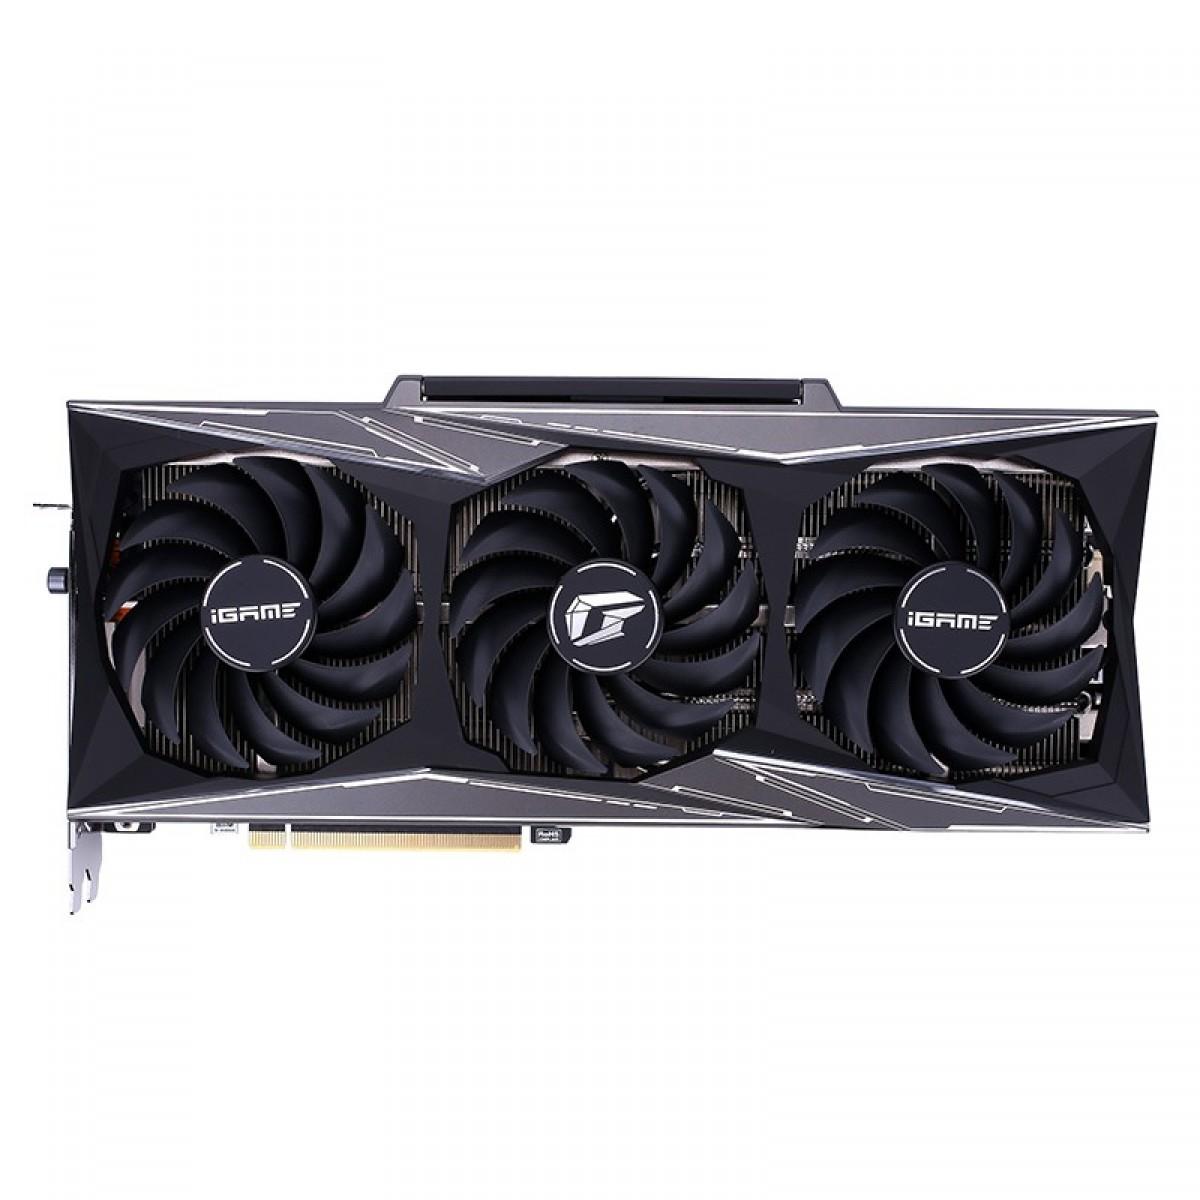 Placa de Vïdeo Colorful iGame GeForce RTX 3070 Ti Vulcan OC-V, 8GB, GDDR6, 256bit, LHR 212326116807